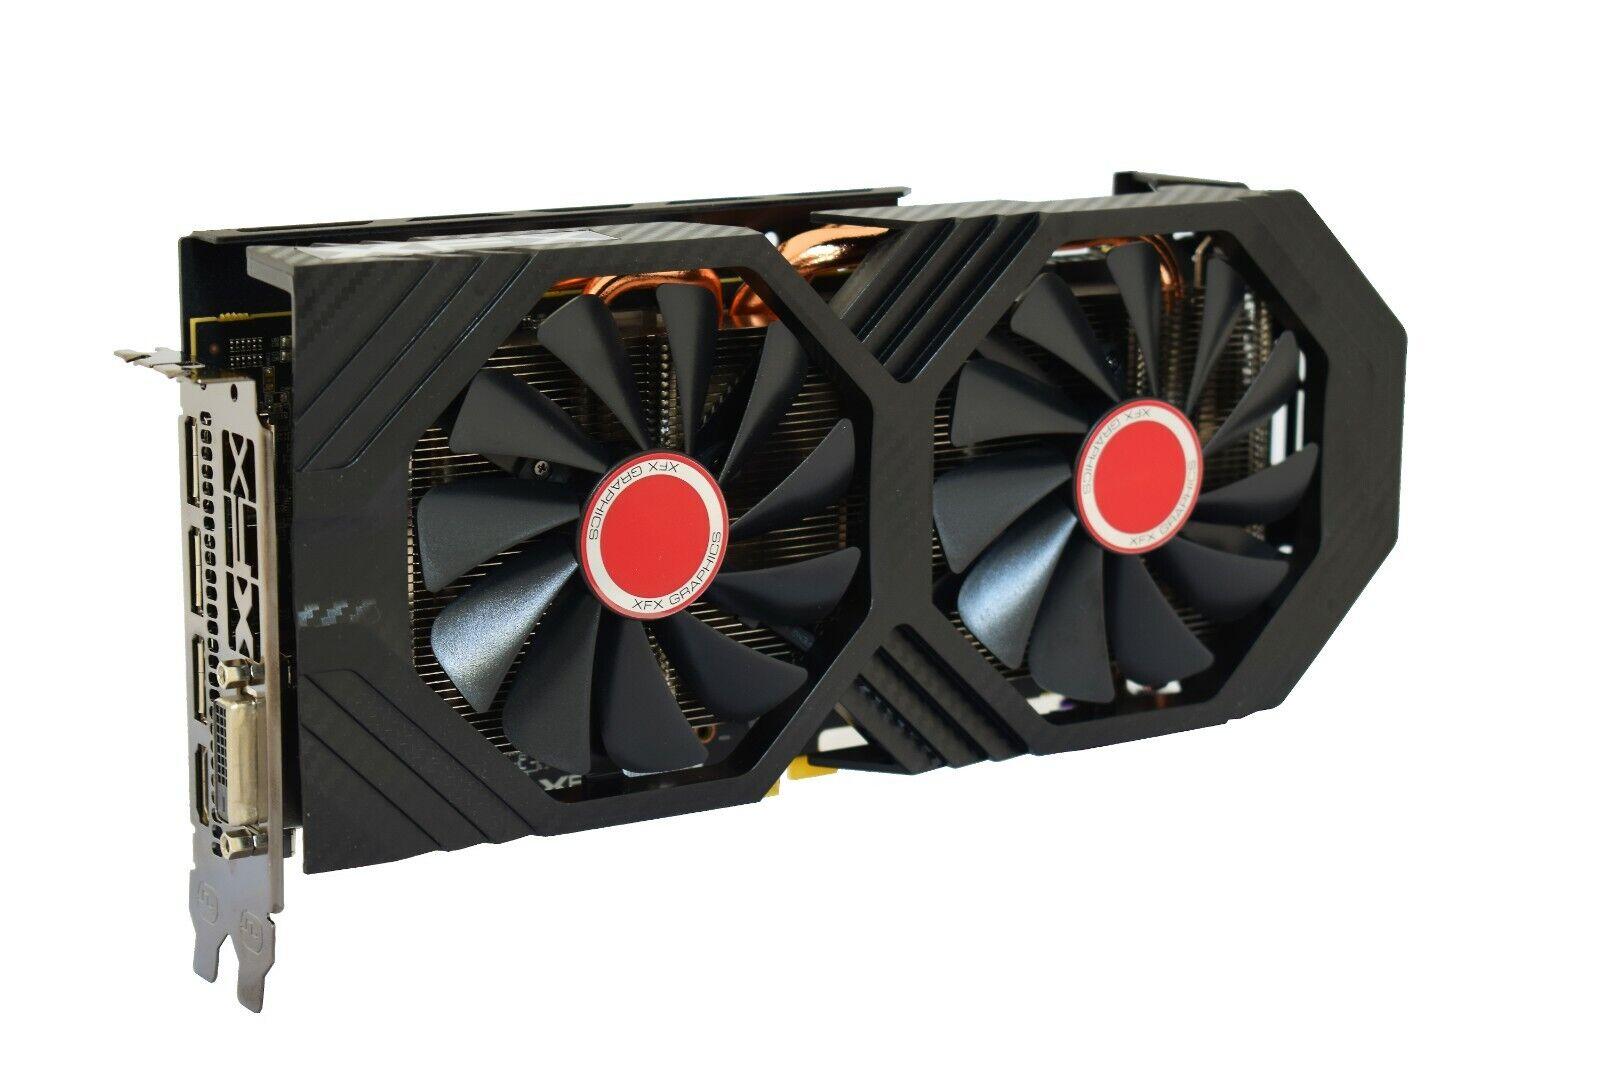 XFX RX 590 FATBOY Core Edition 8GB 1580MHz DDR5 Graphics Card RX-590P8DLD6 2